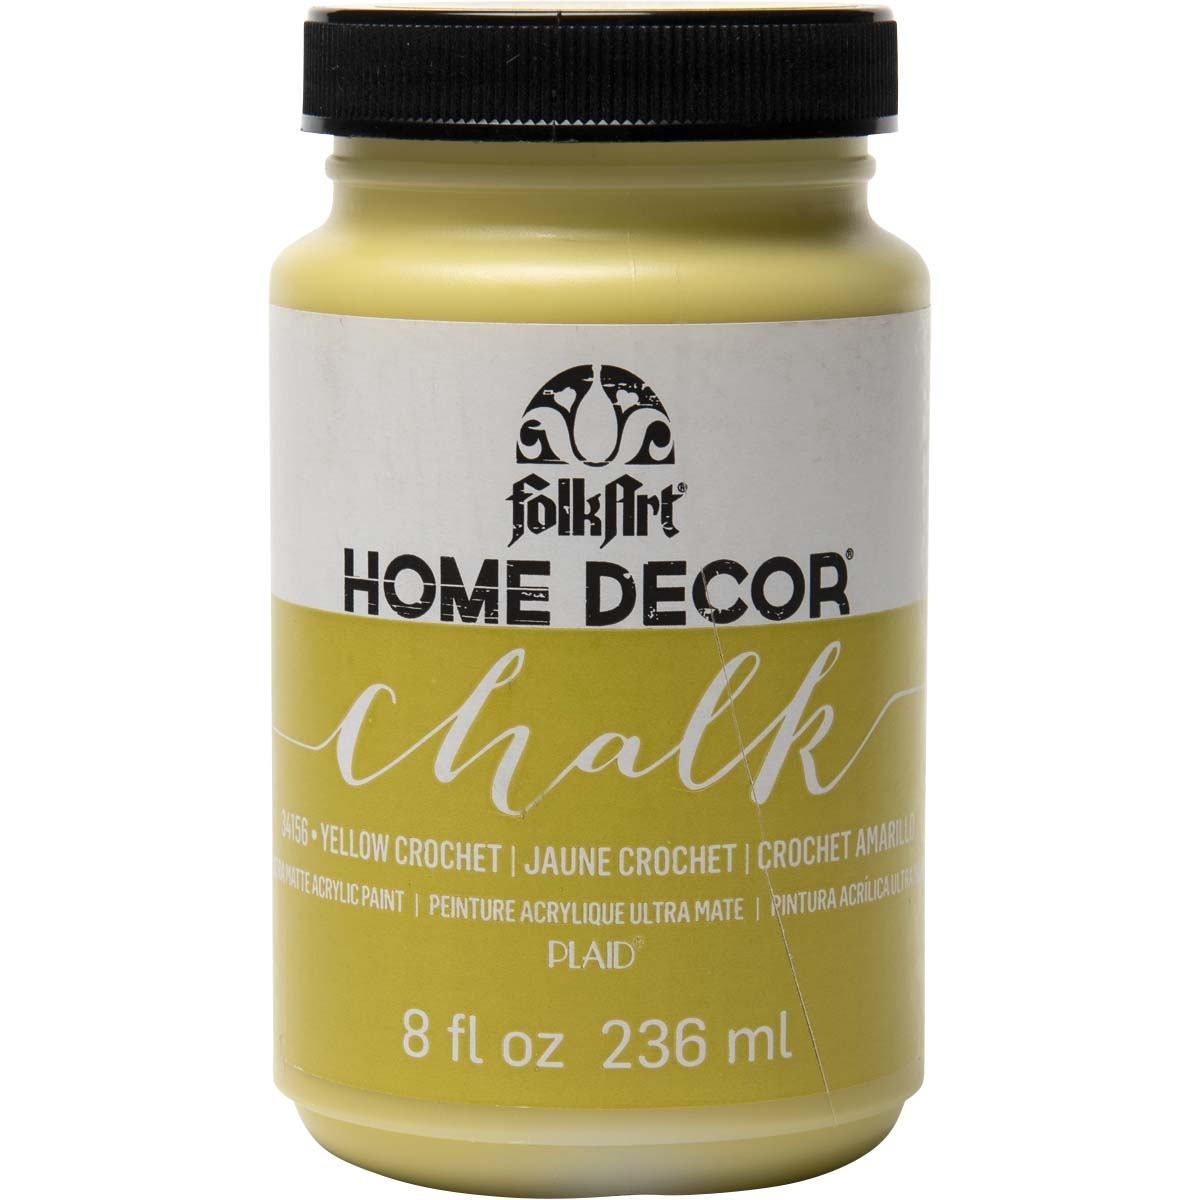 FolkArt ® Home Decor™ Chalk - Yellow Crochet, 8 oz.